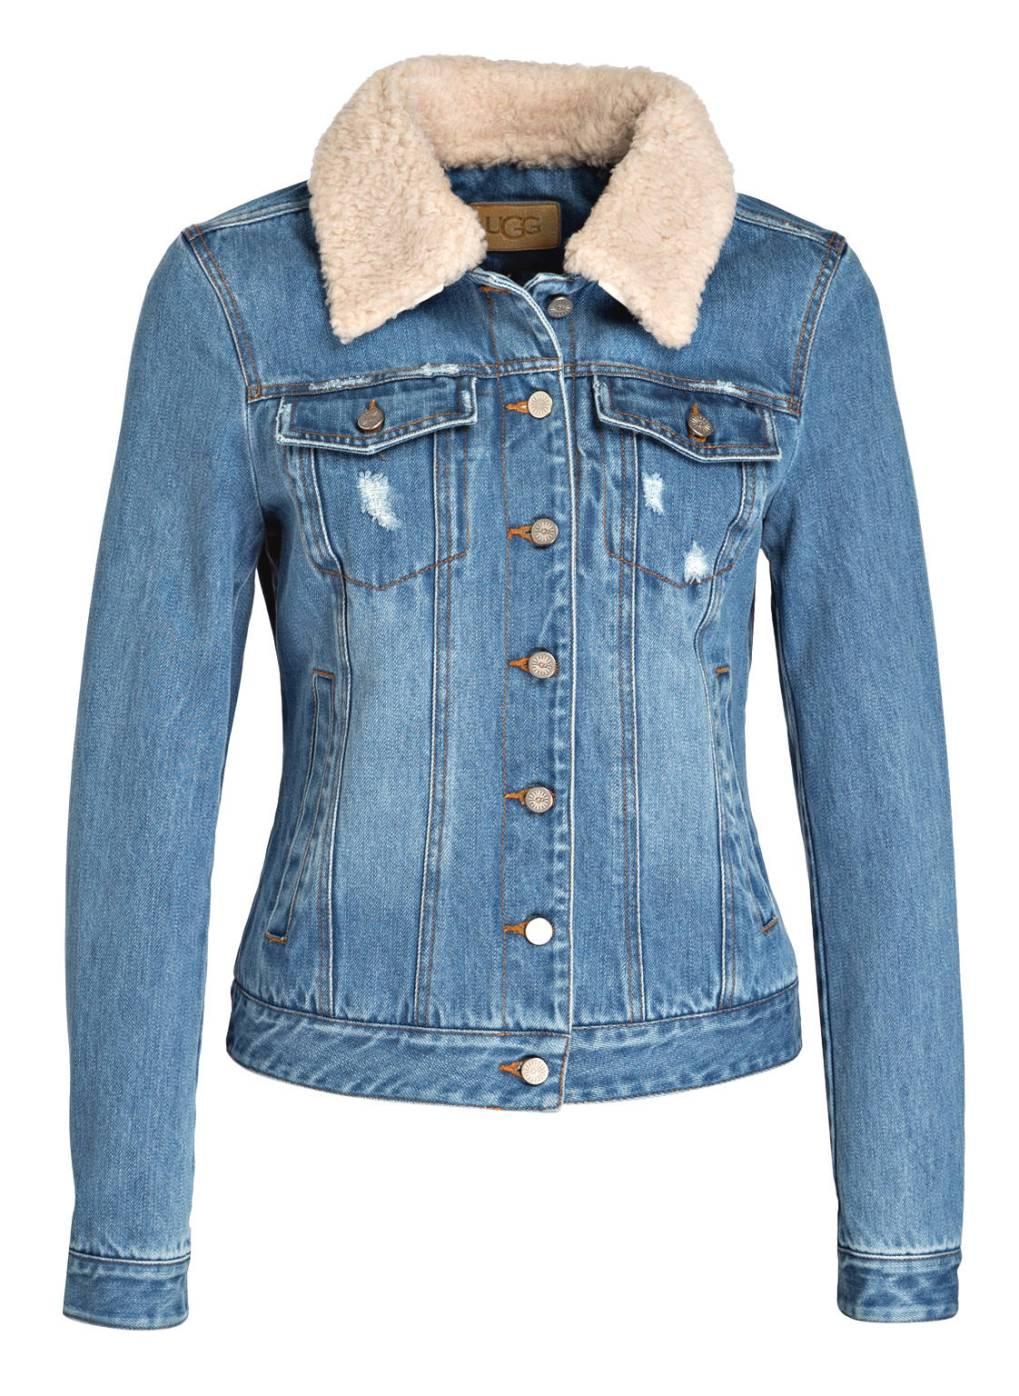 UGG Jeansjacke mit Besatz in Felloptik